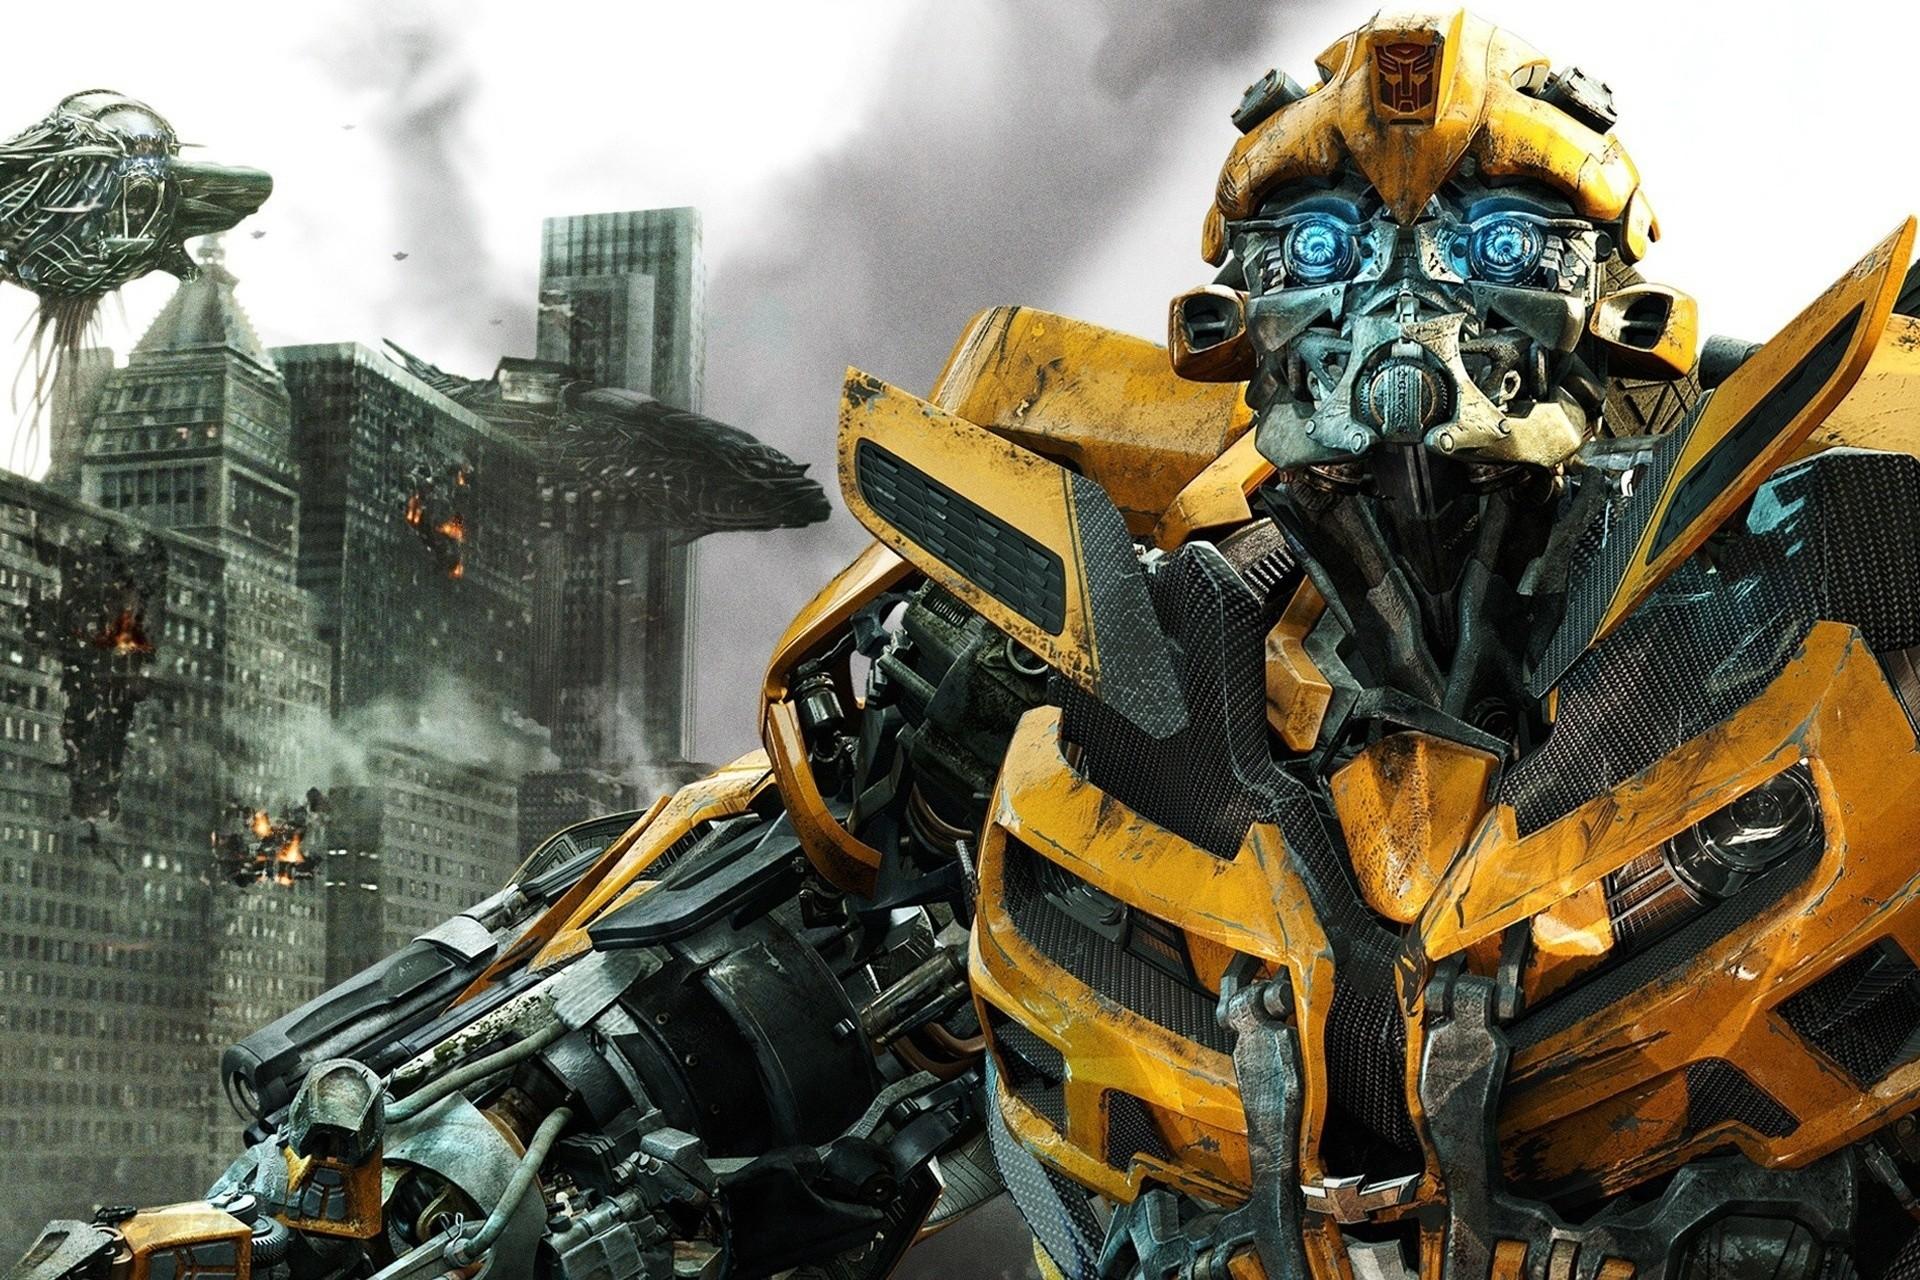 HD Movie Wallpaper | Bumblbee Wallpaper Full Hd Transformers 3  The Dark Side Of Moon